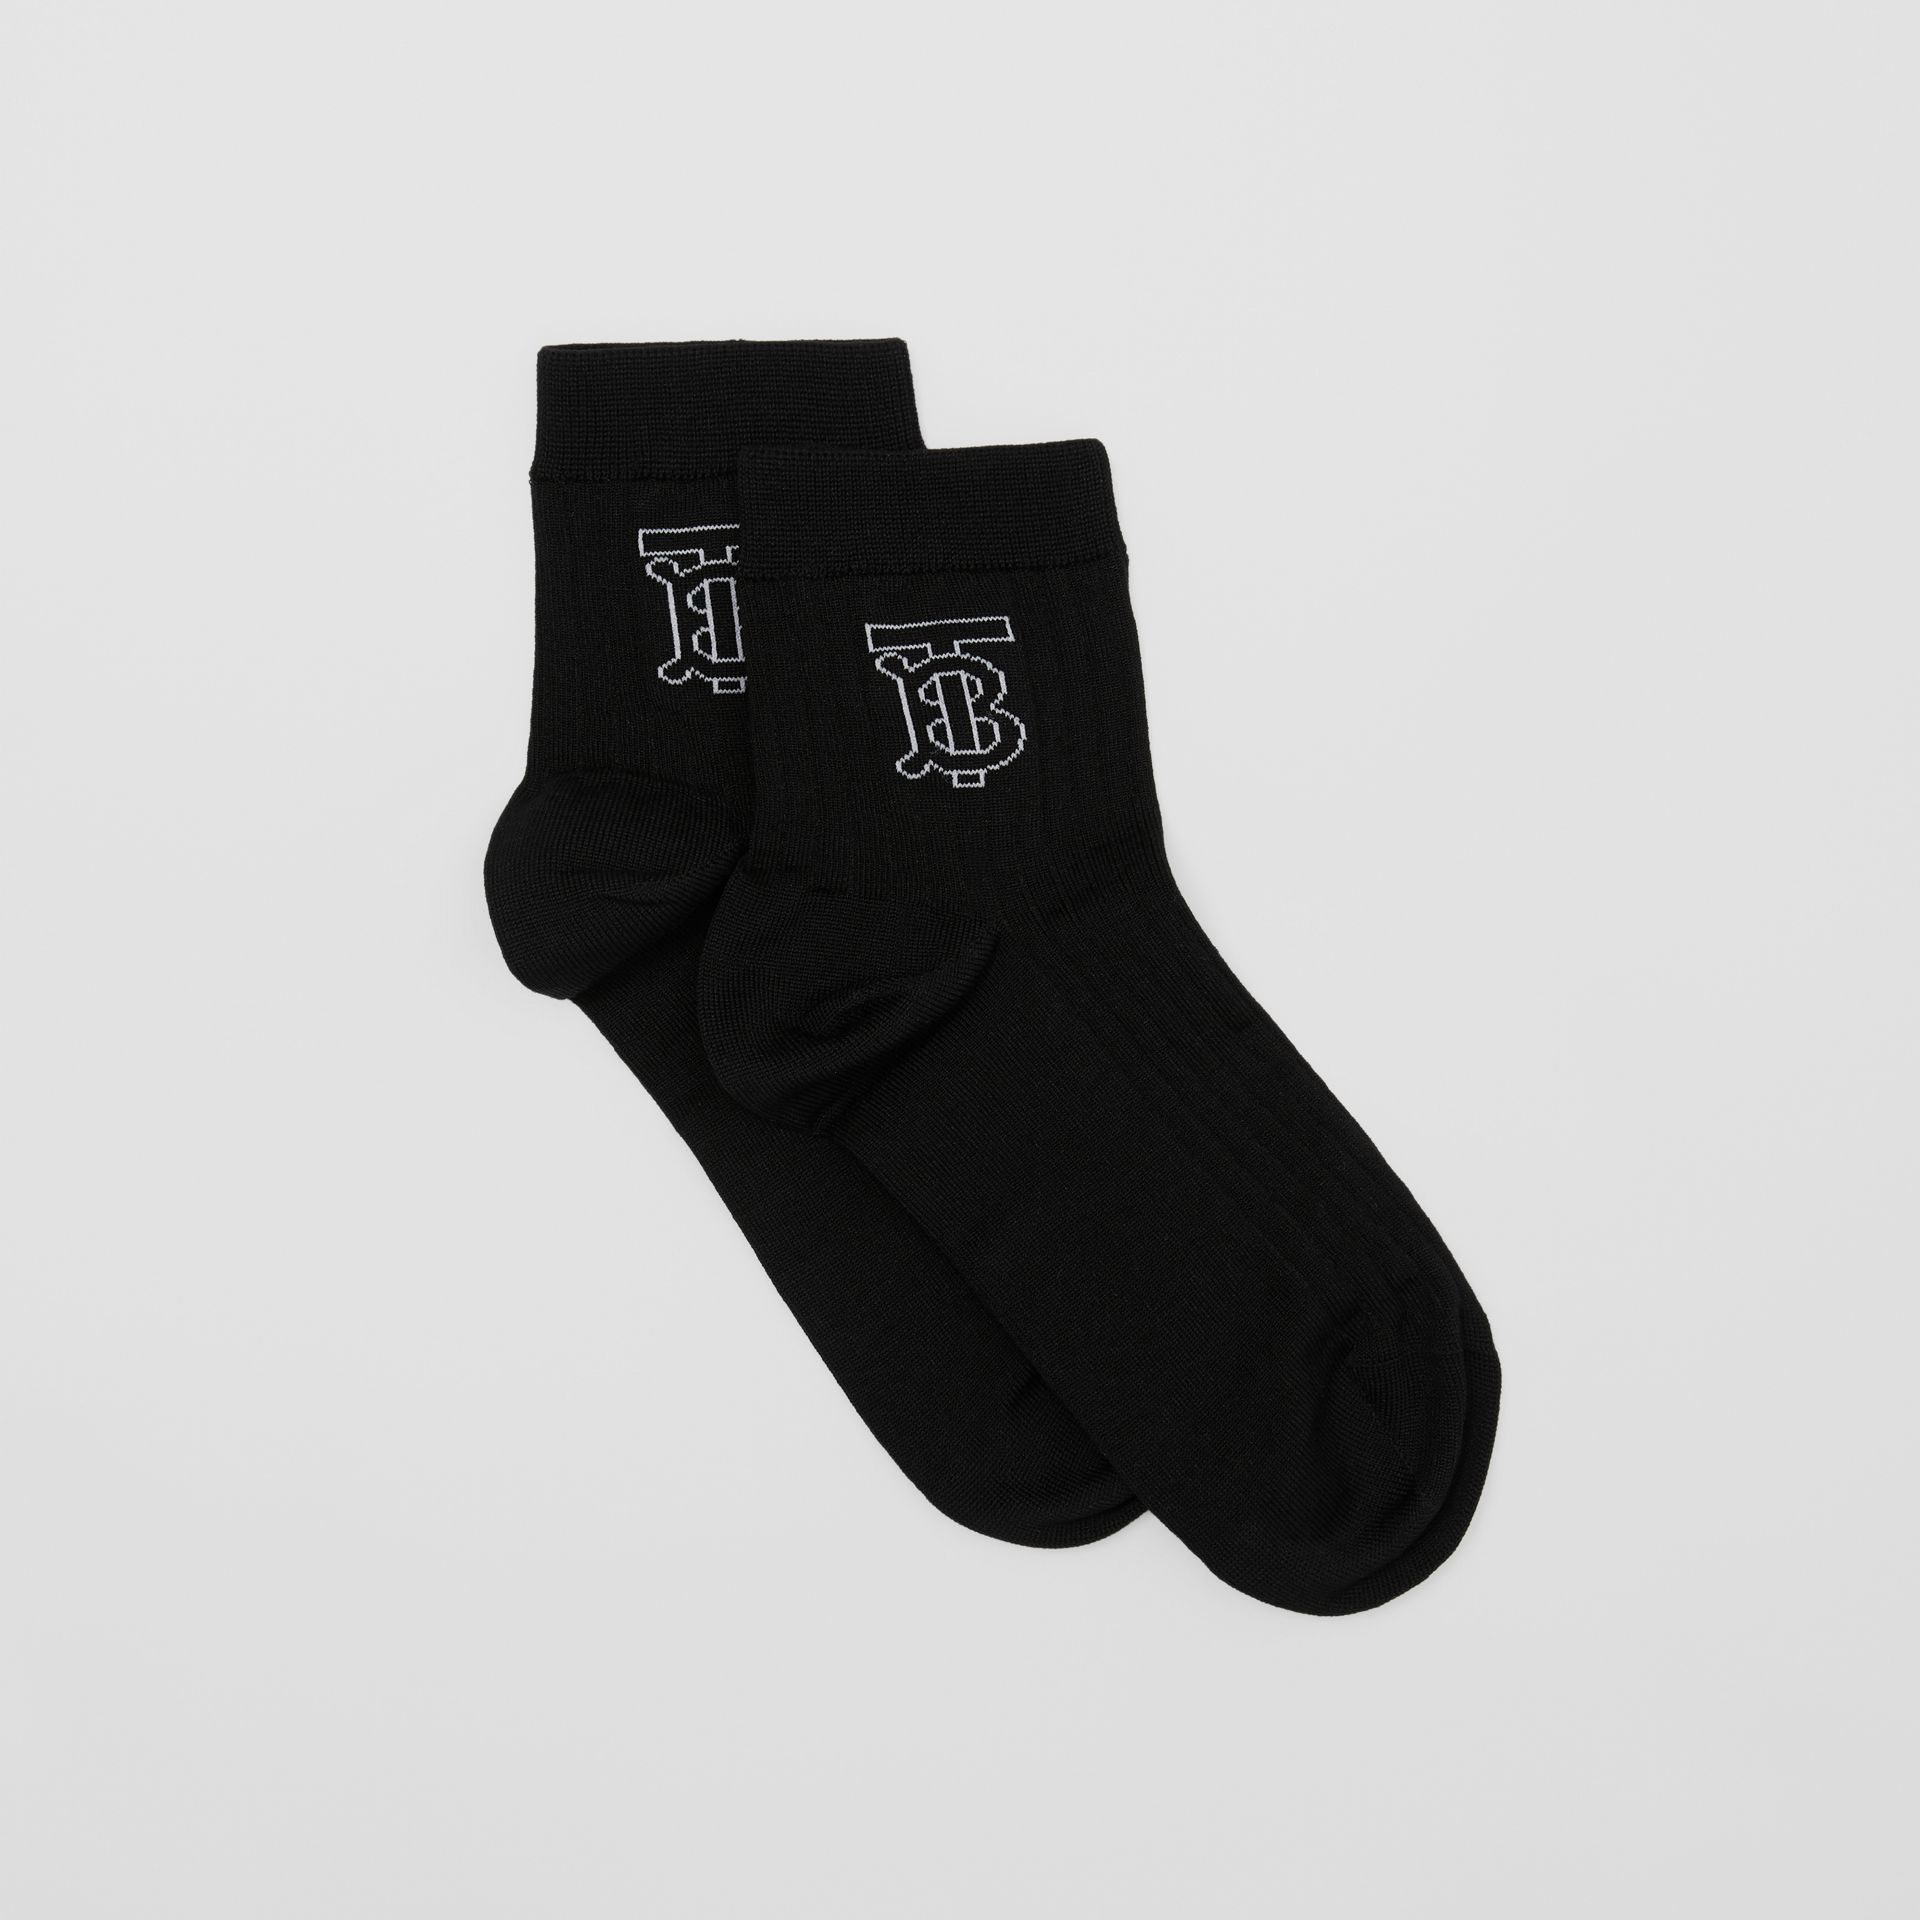 Monogram Intarsia Cotton Blend Socks in Black/white   Burberry United States - gallery image 2